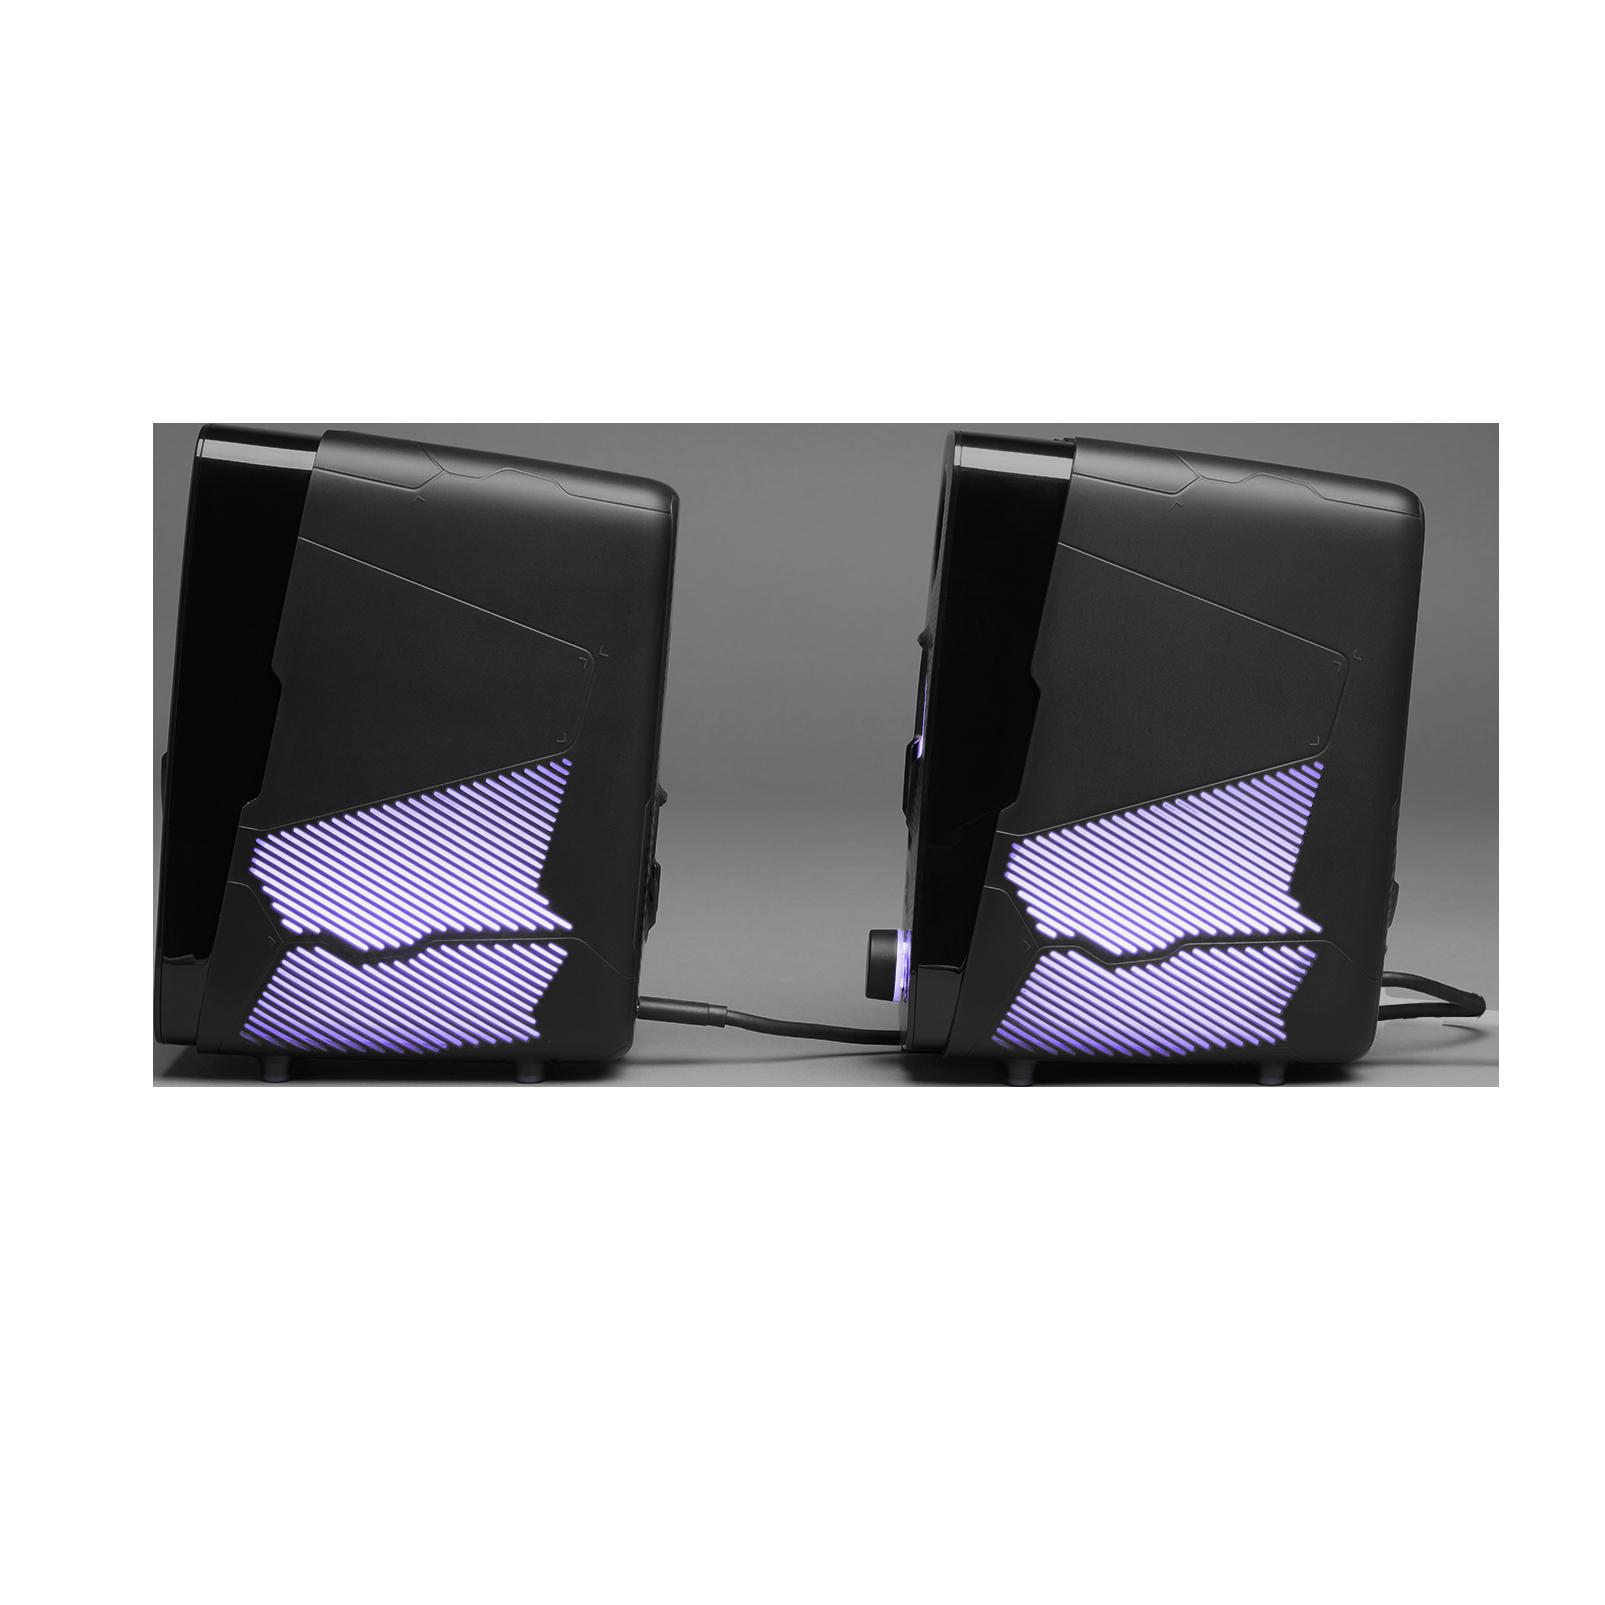 JBL Quantum Duo - Black Matte - PC Gaming Speakers - Left